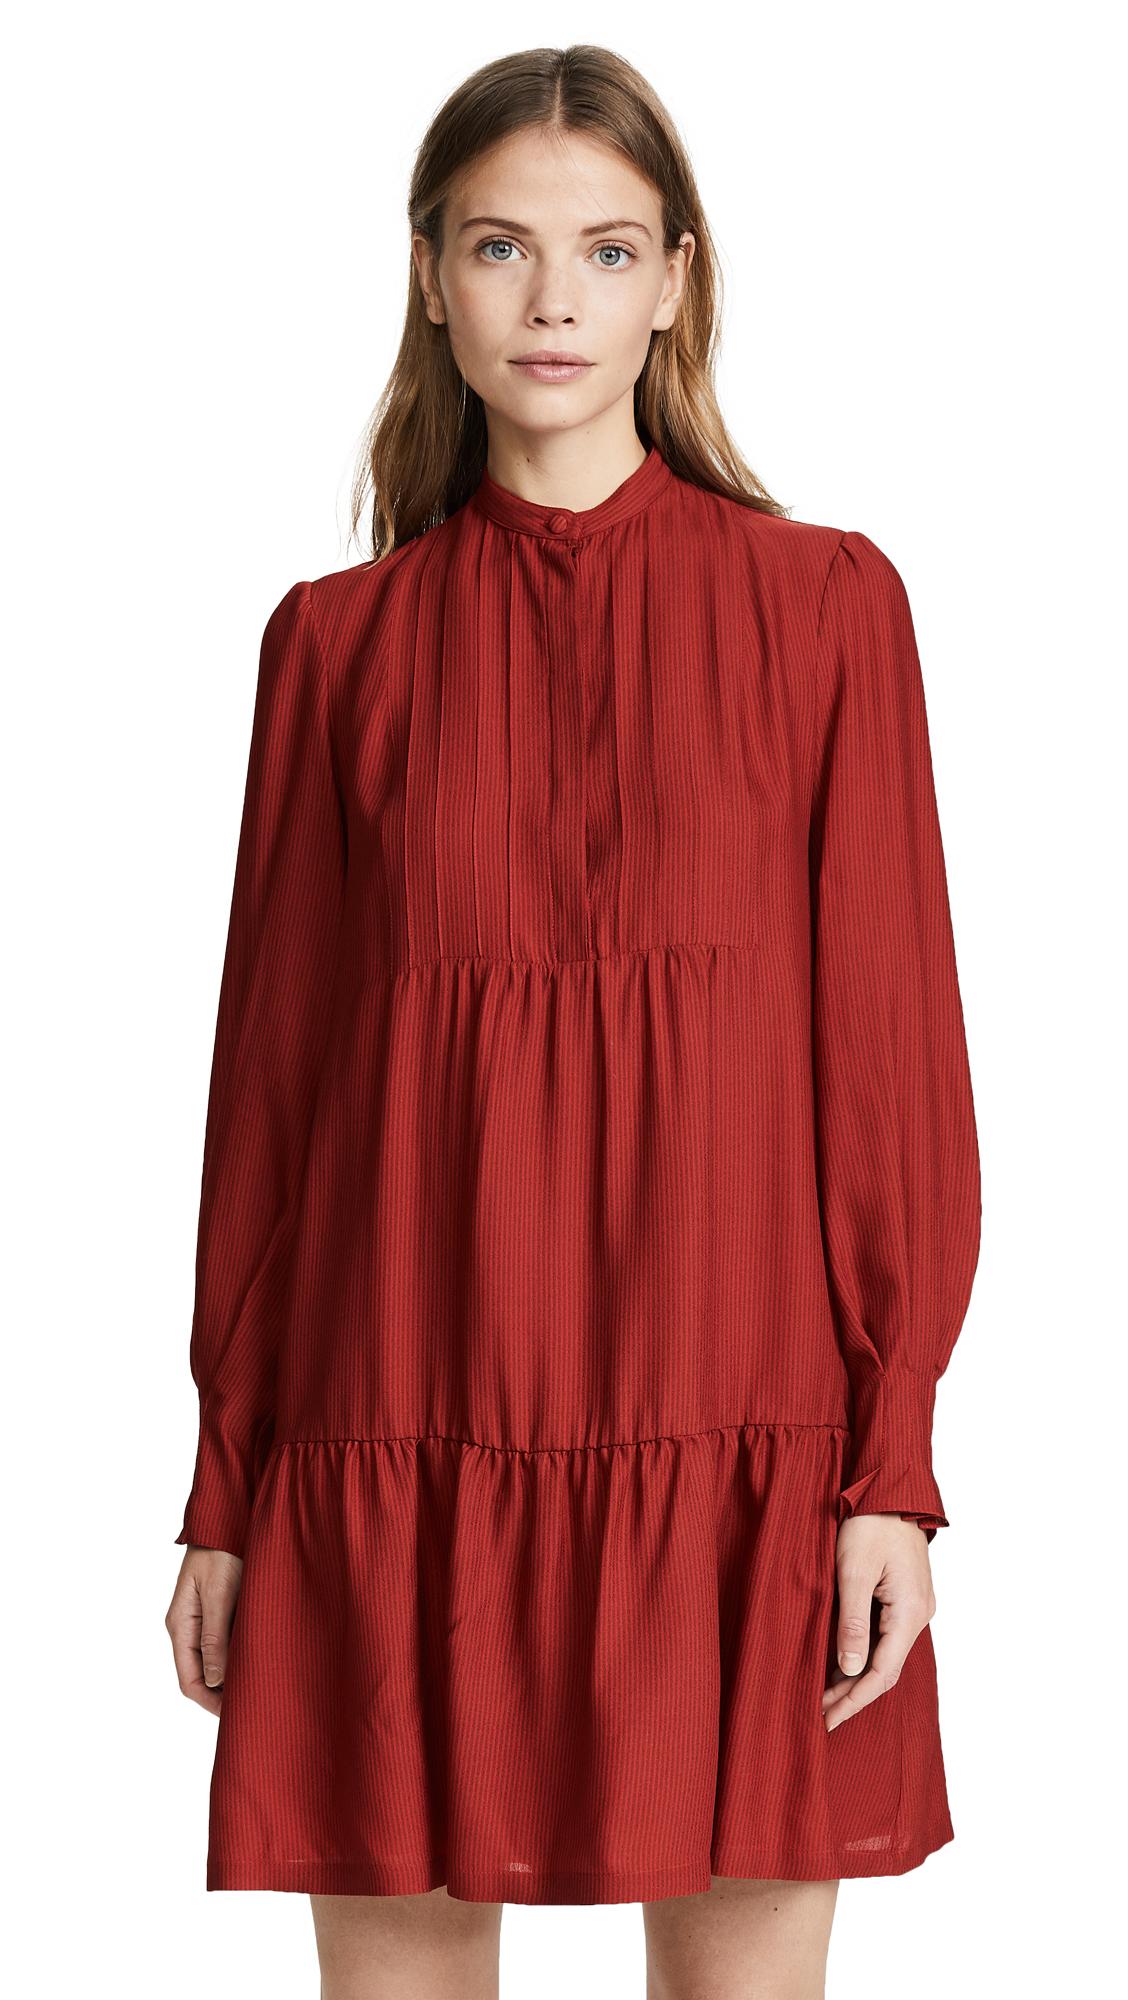 A.P.C. Jones Shirtdress